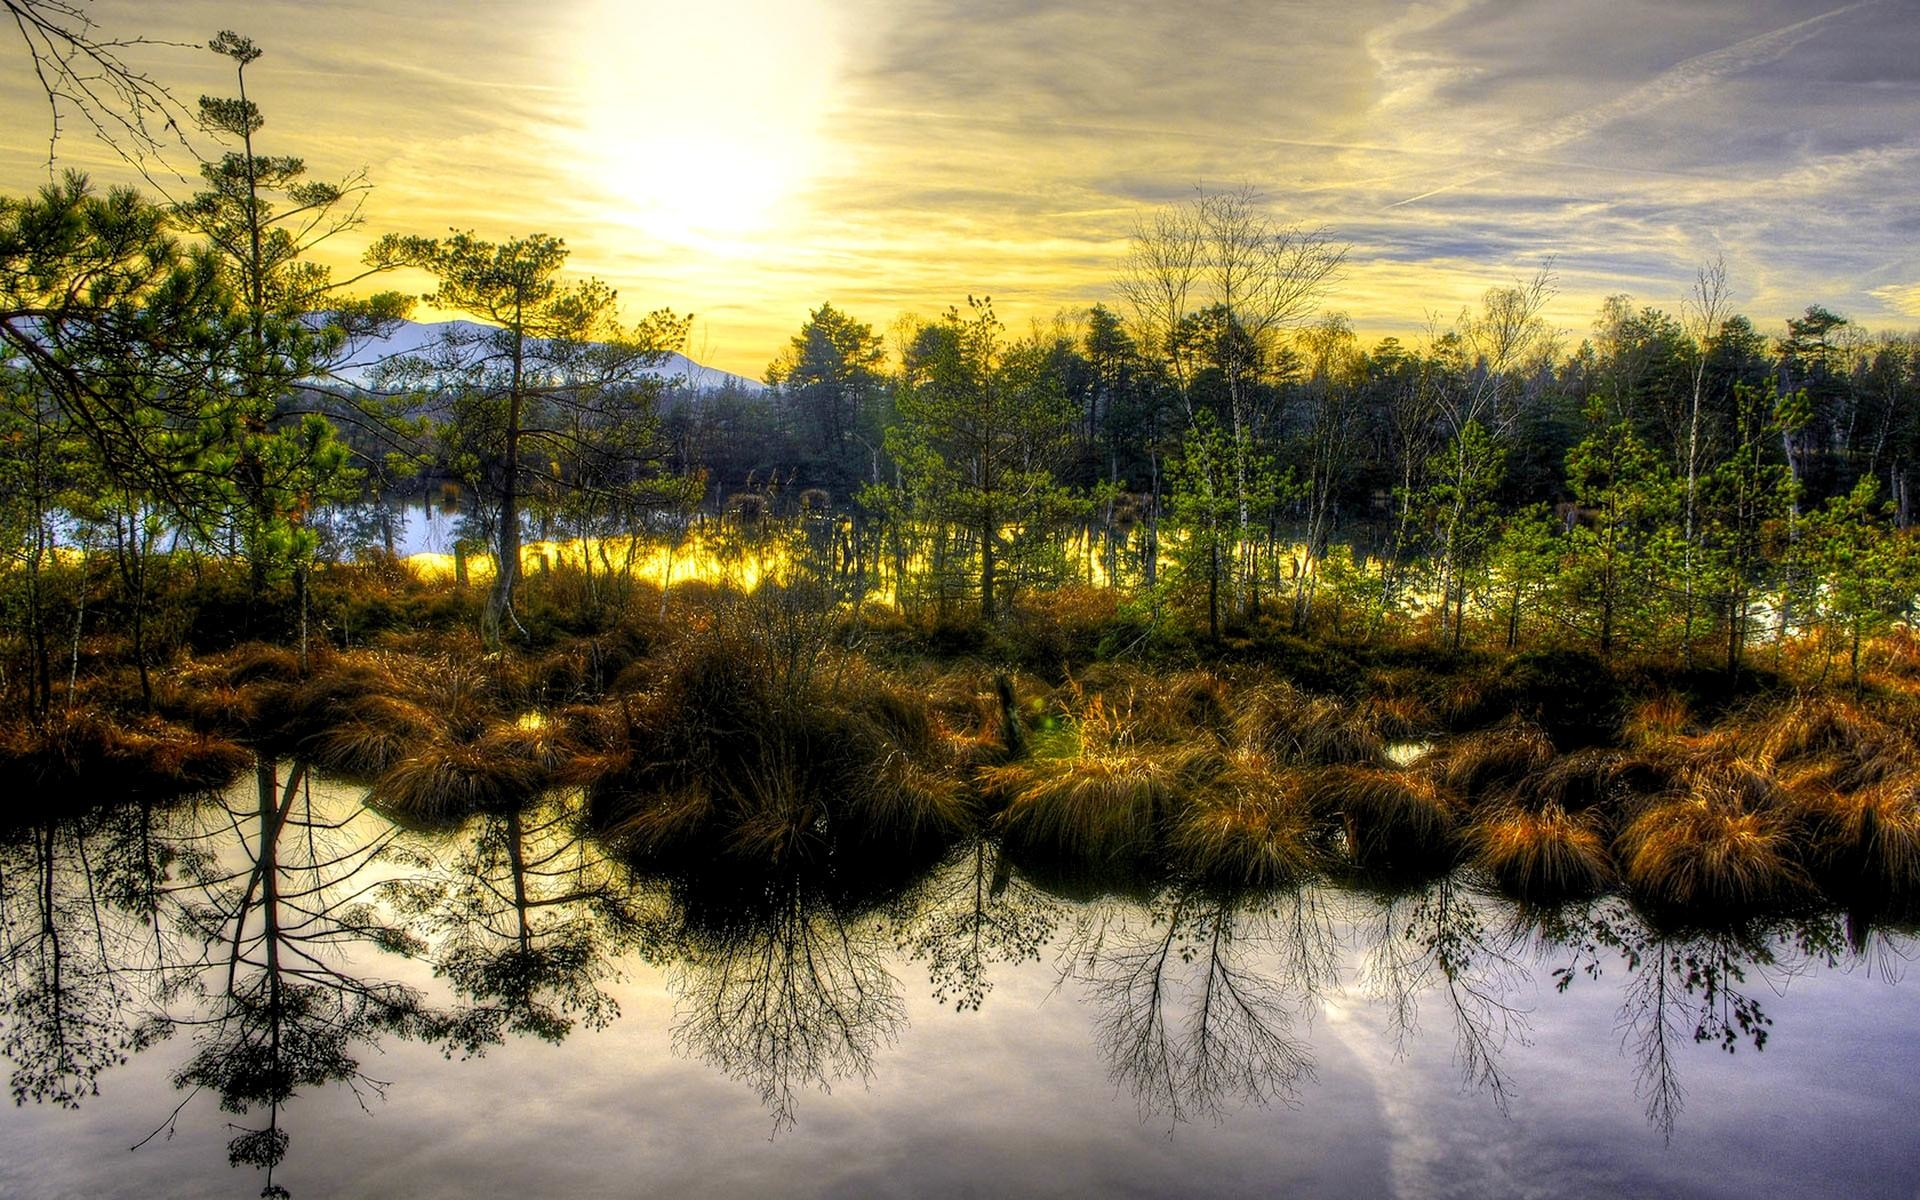 Swamp Wallpapers For Desktop 73 Images